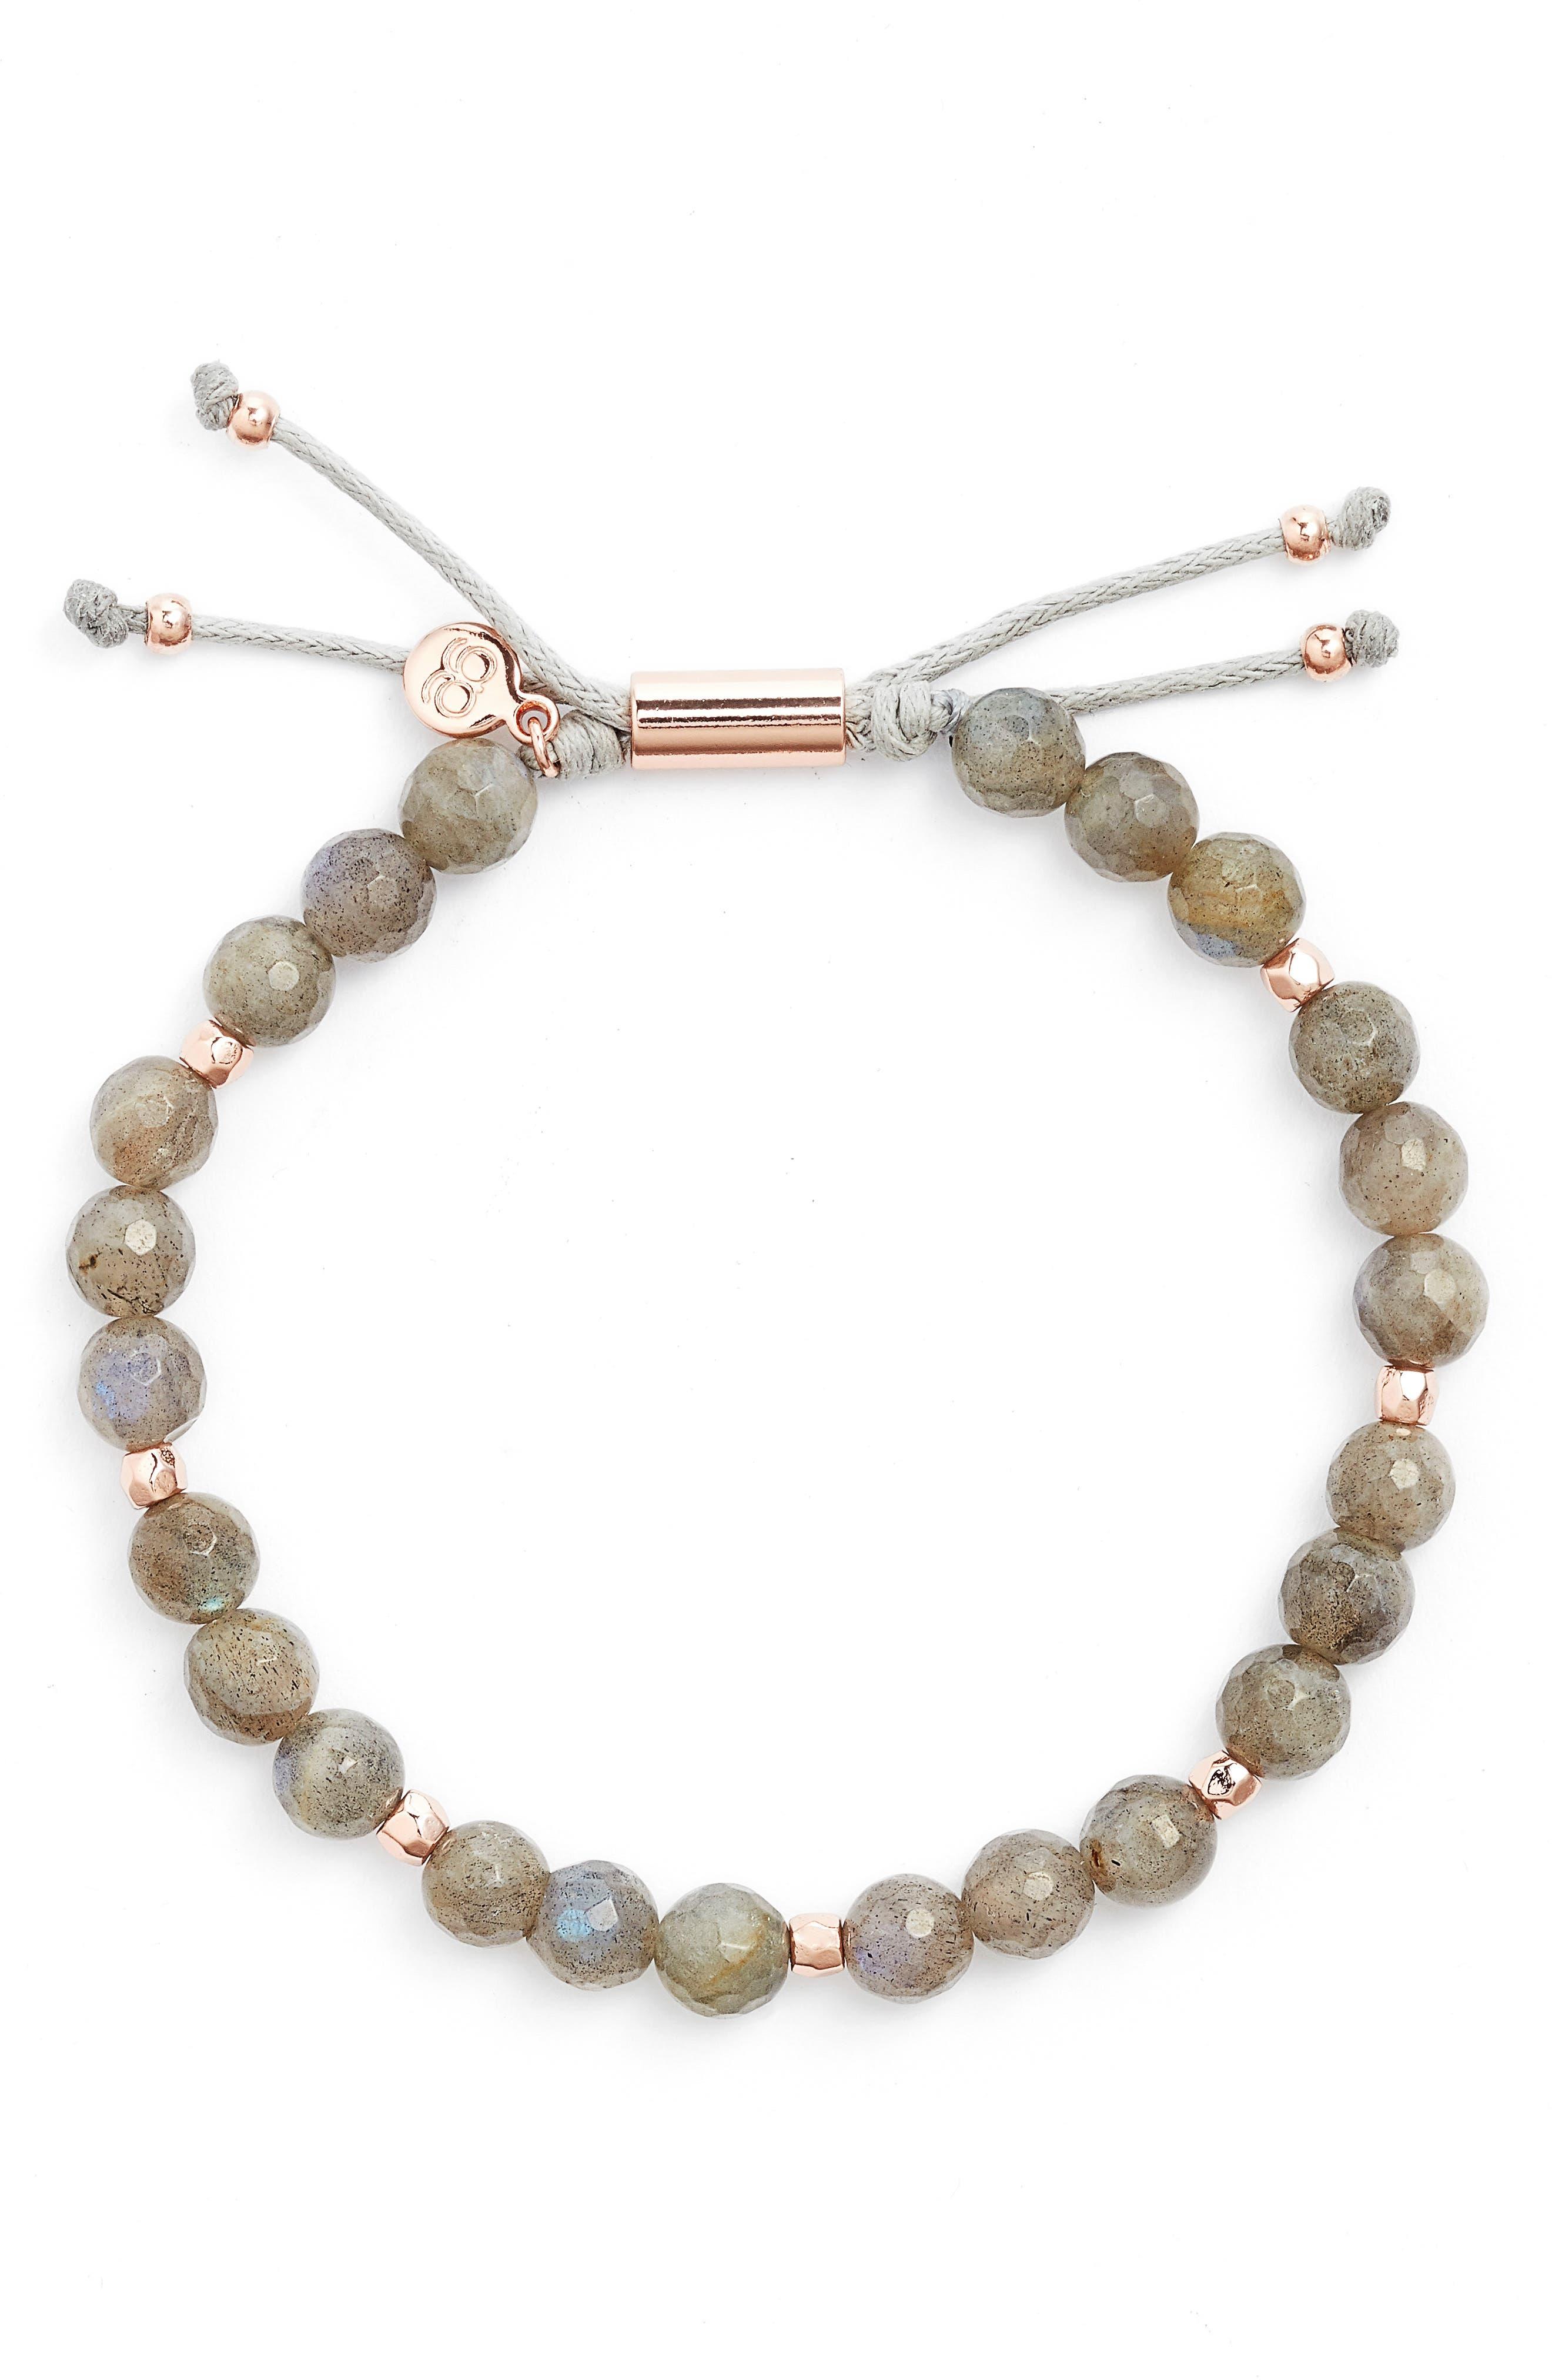 Main Image - gorjana Power Bead Adjustable Bracelet